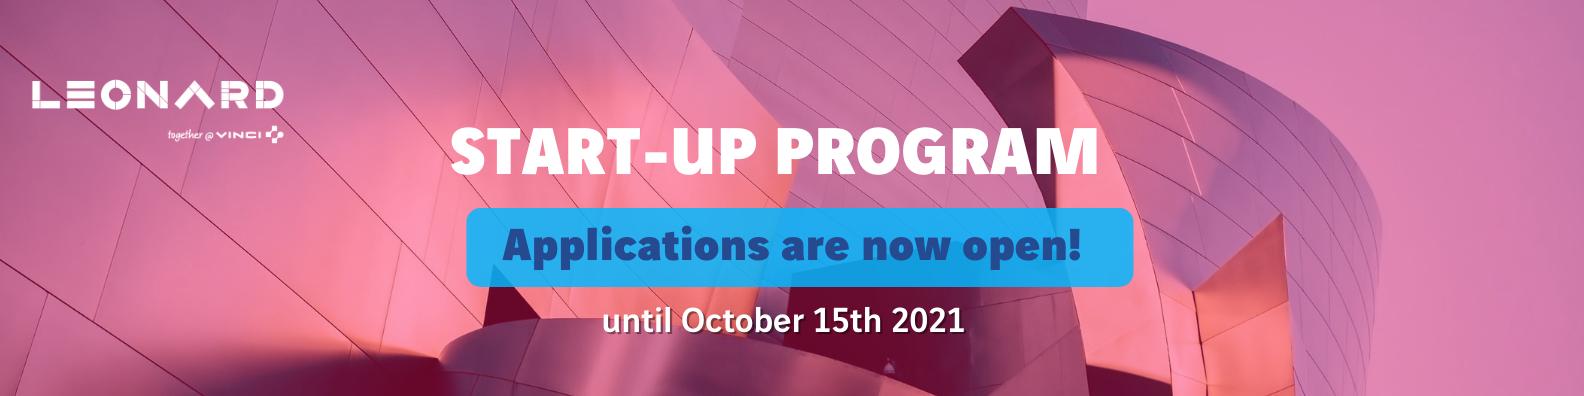 startup program